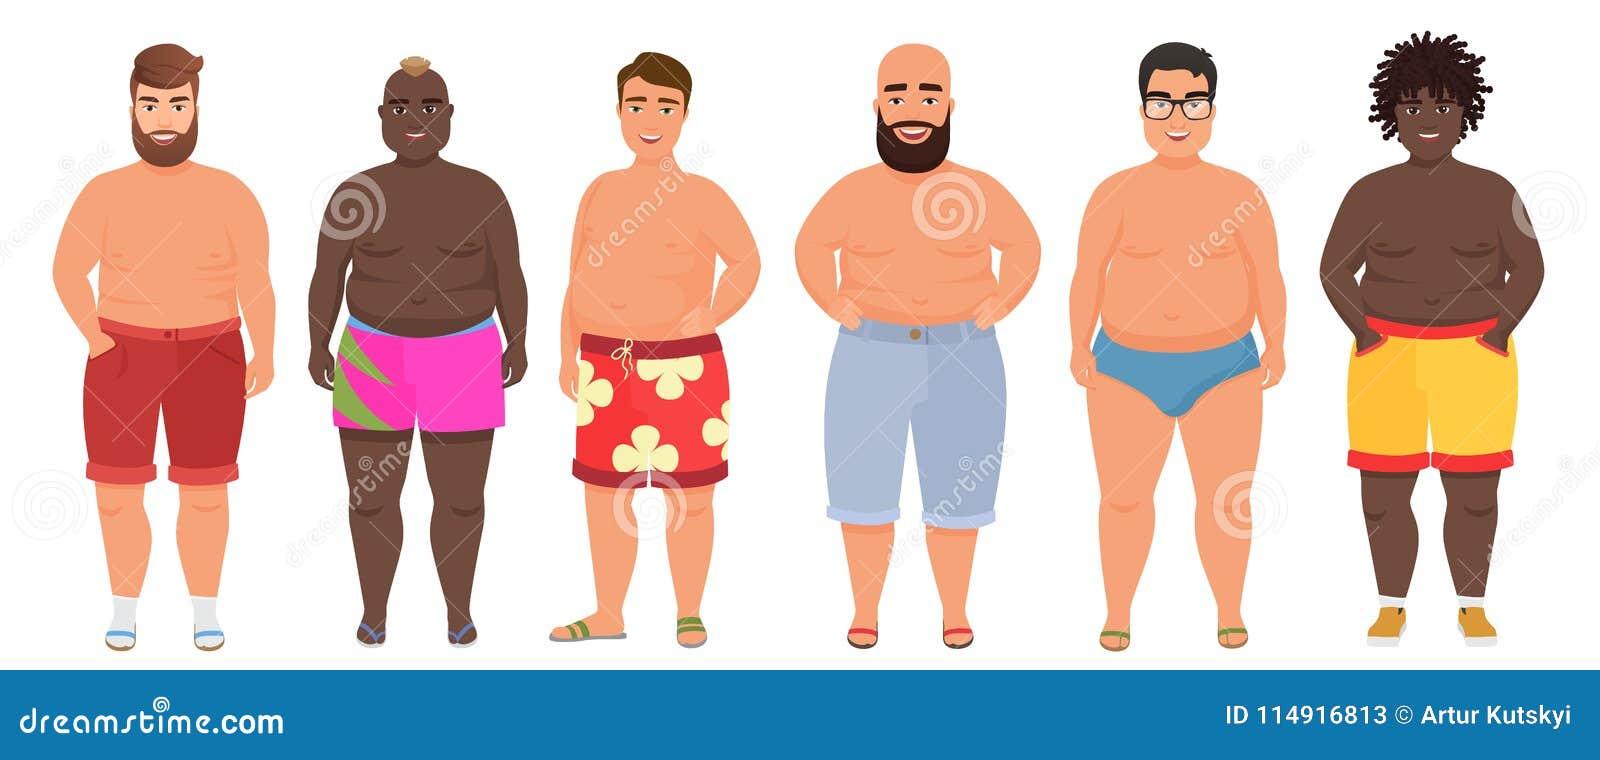 29e2b5a49 Hombre gordo divertido del vector de la historieta en la ropa interior